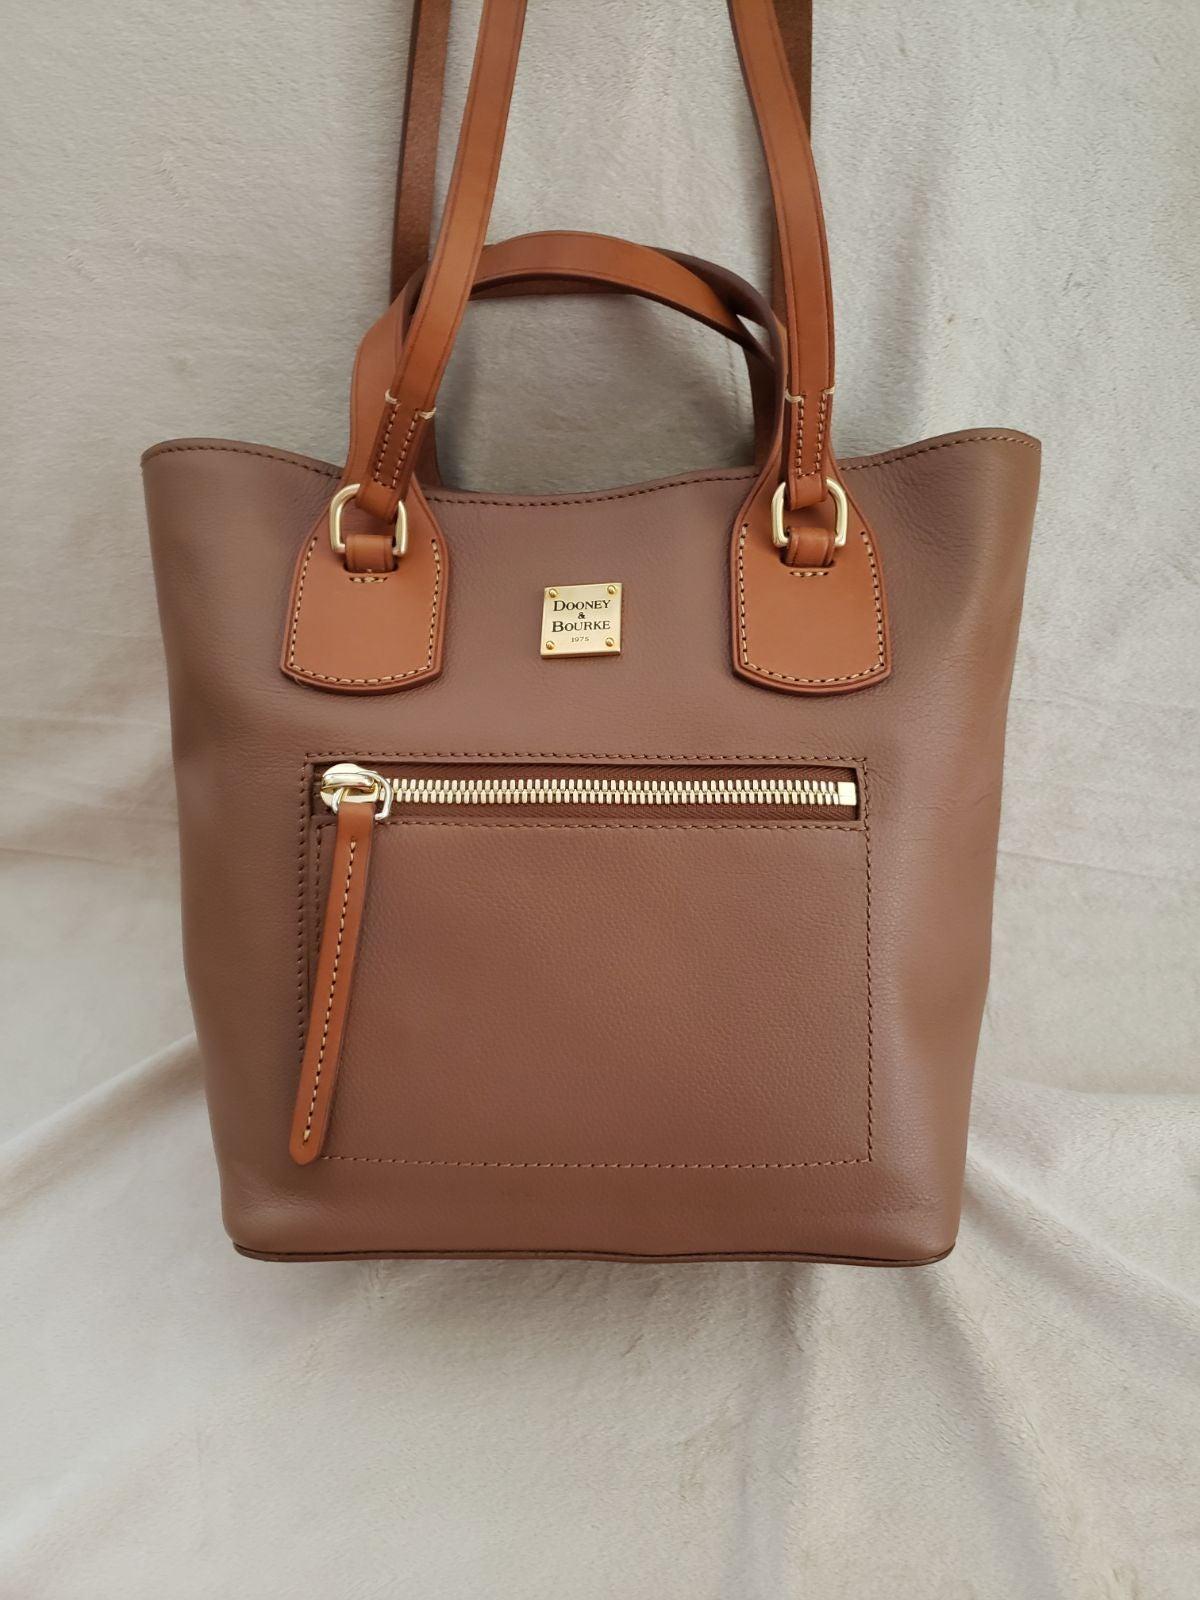 Dooney & Bourke Raleigh Leather Jenny Ba